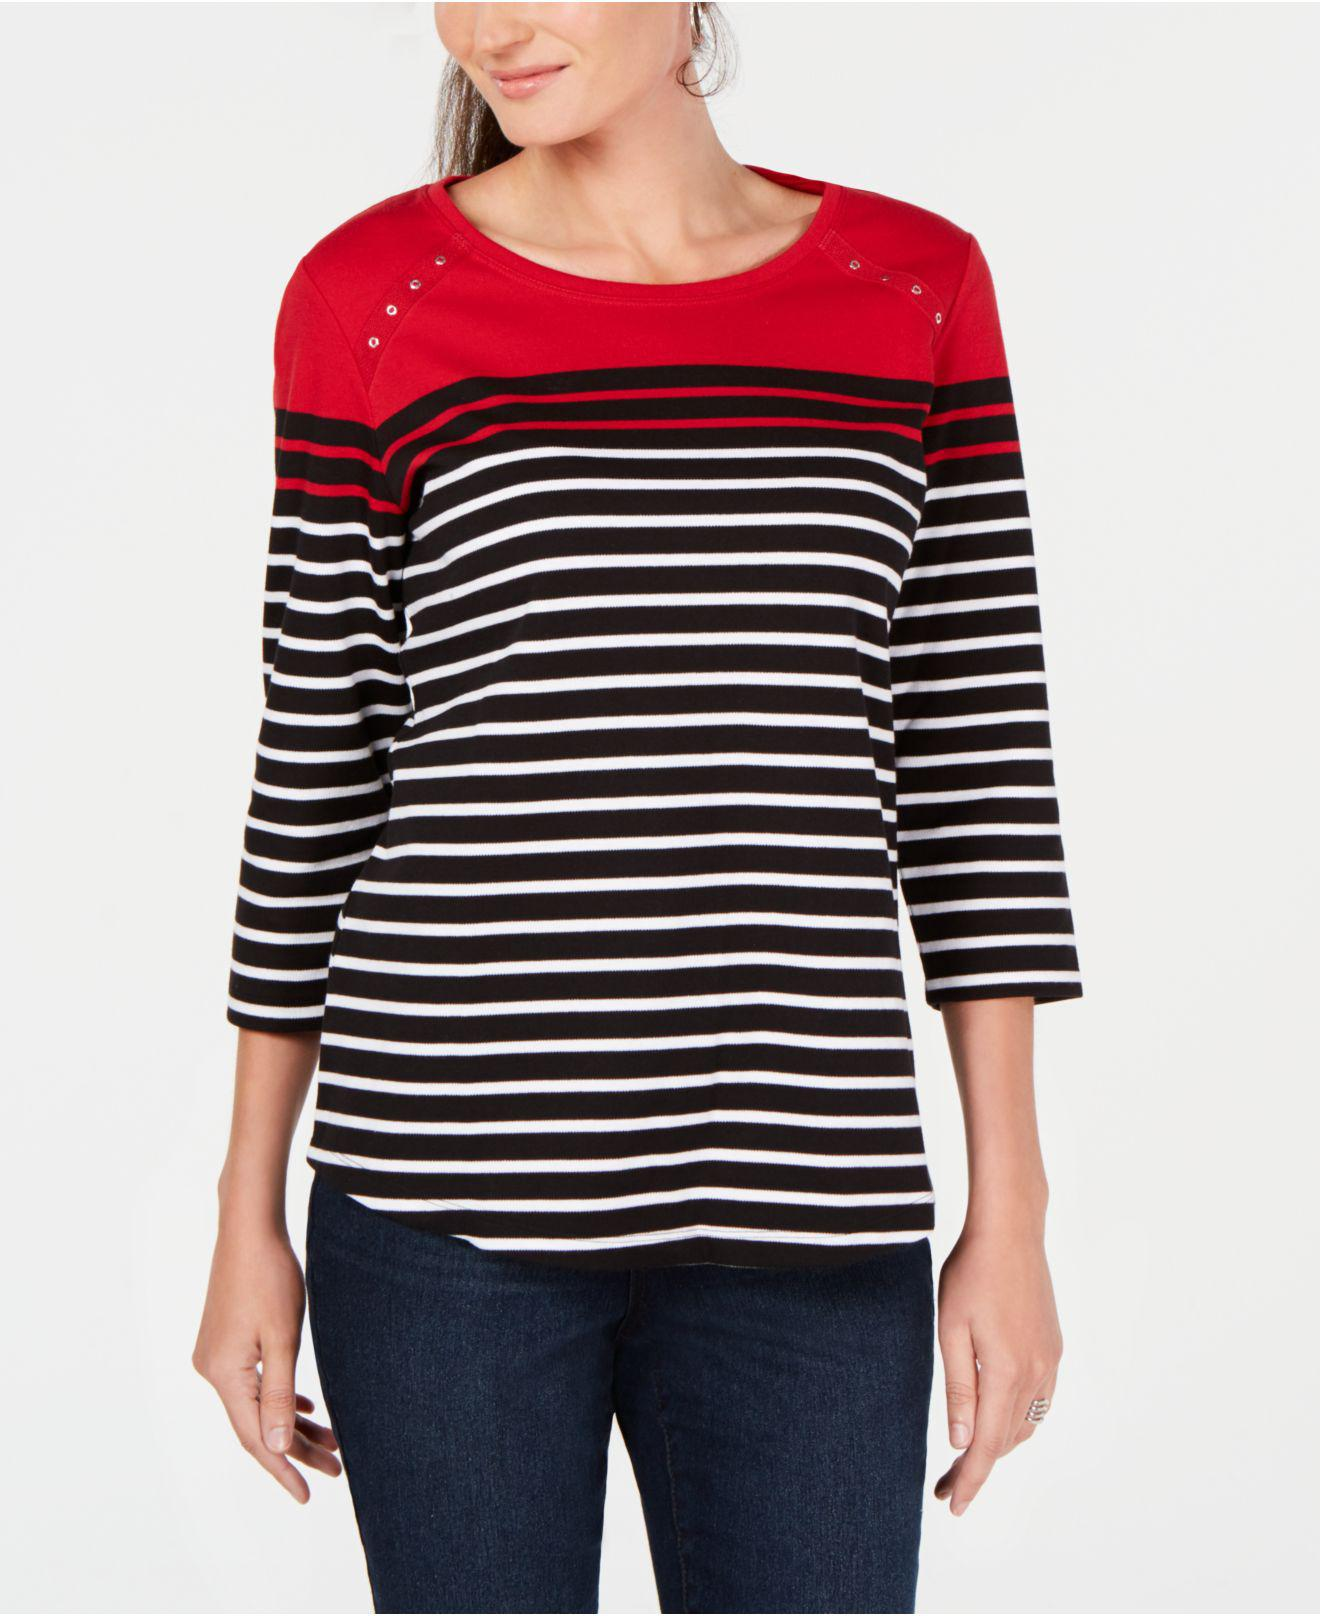 e07f11cee Karen Scott. Women s Red Colorblocked Striped Top